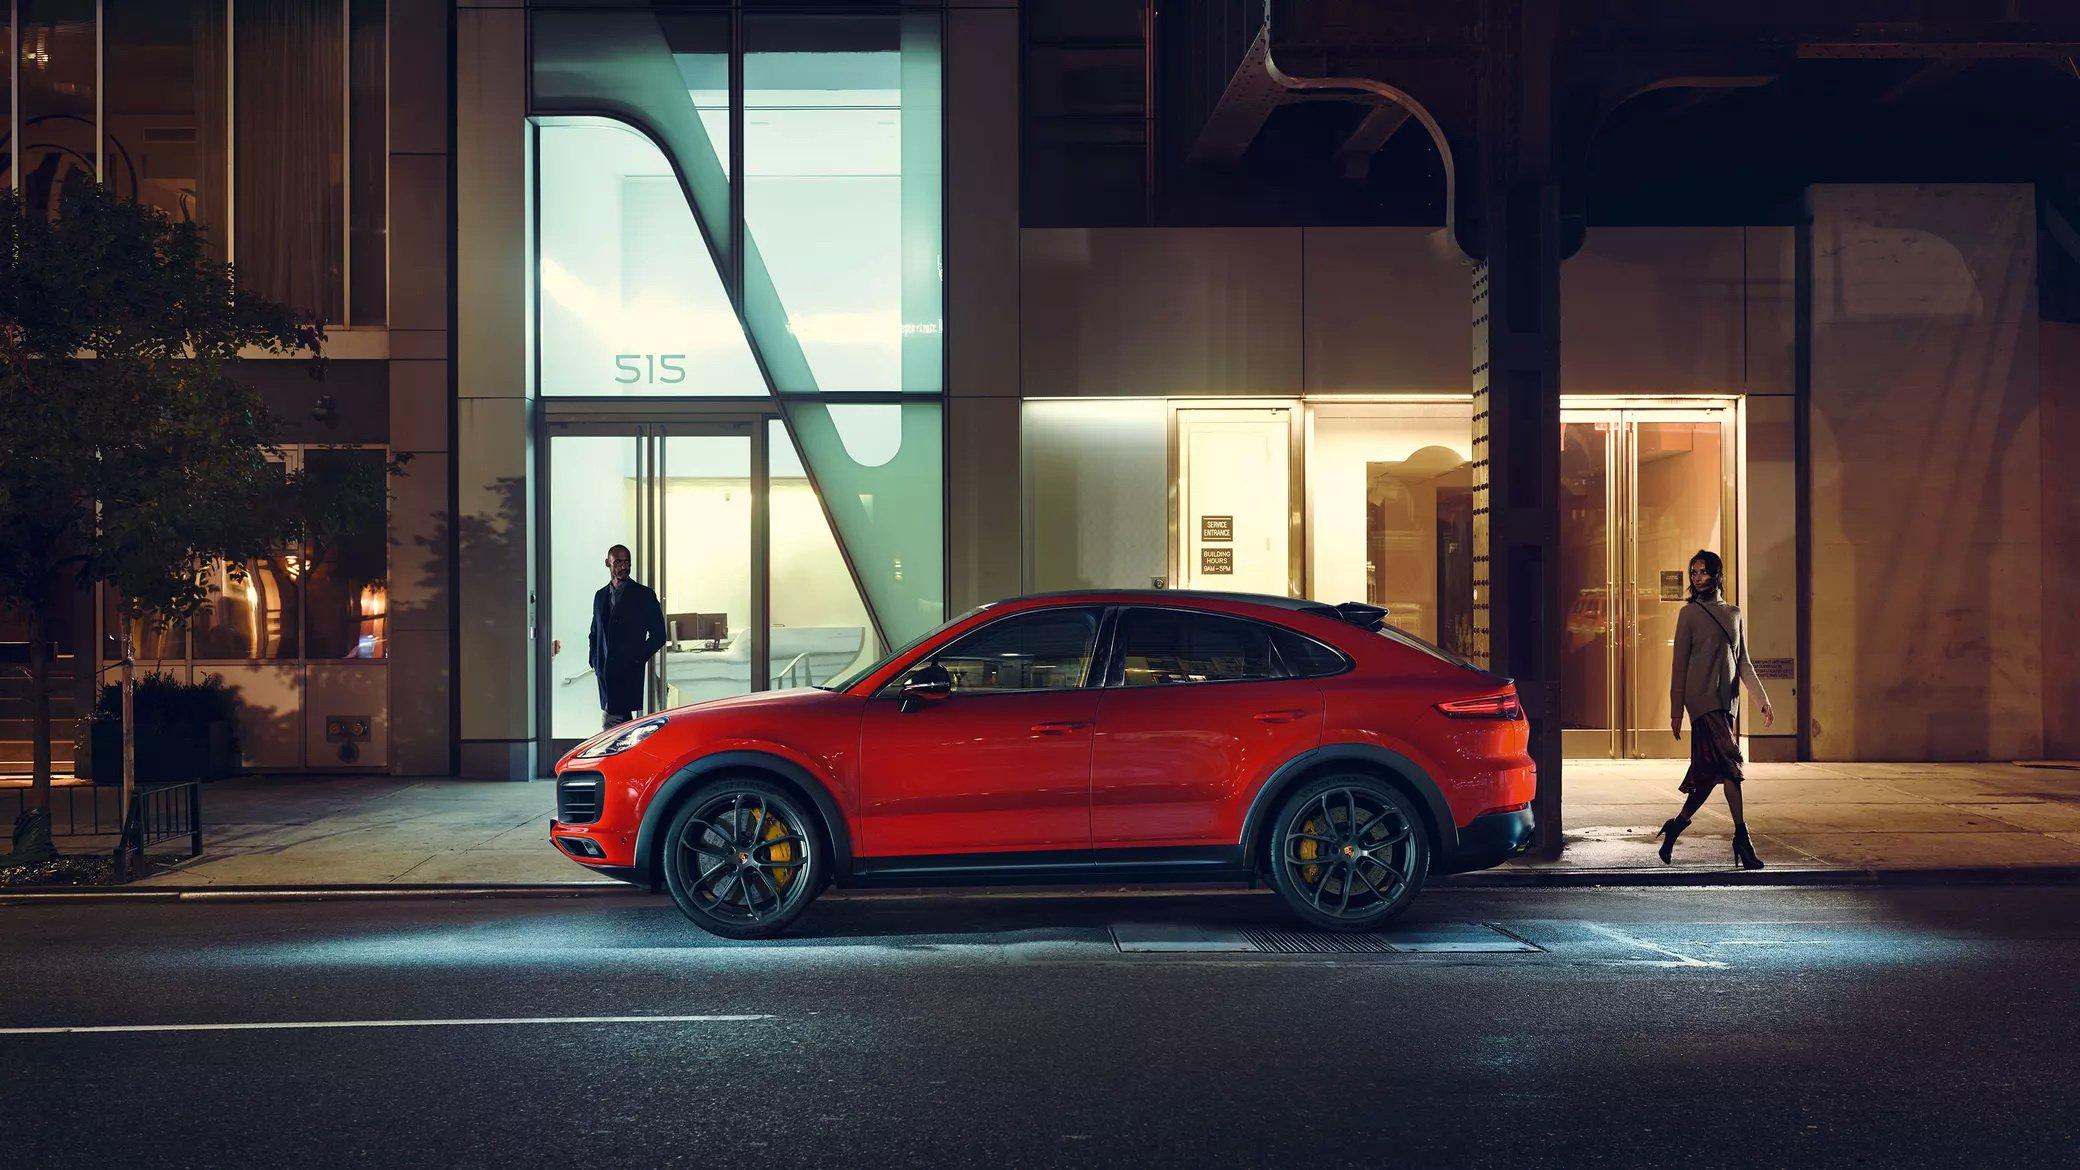 Porsche Preparing To Reveal Cayenne Turbo S E Hybrid